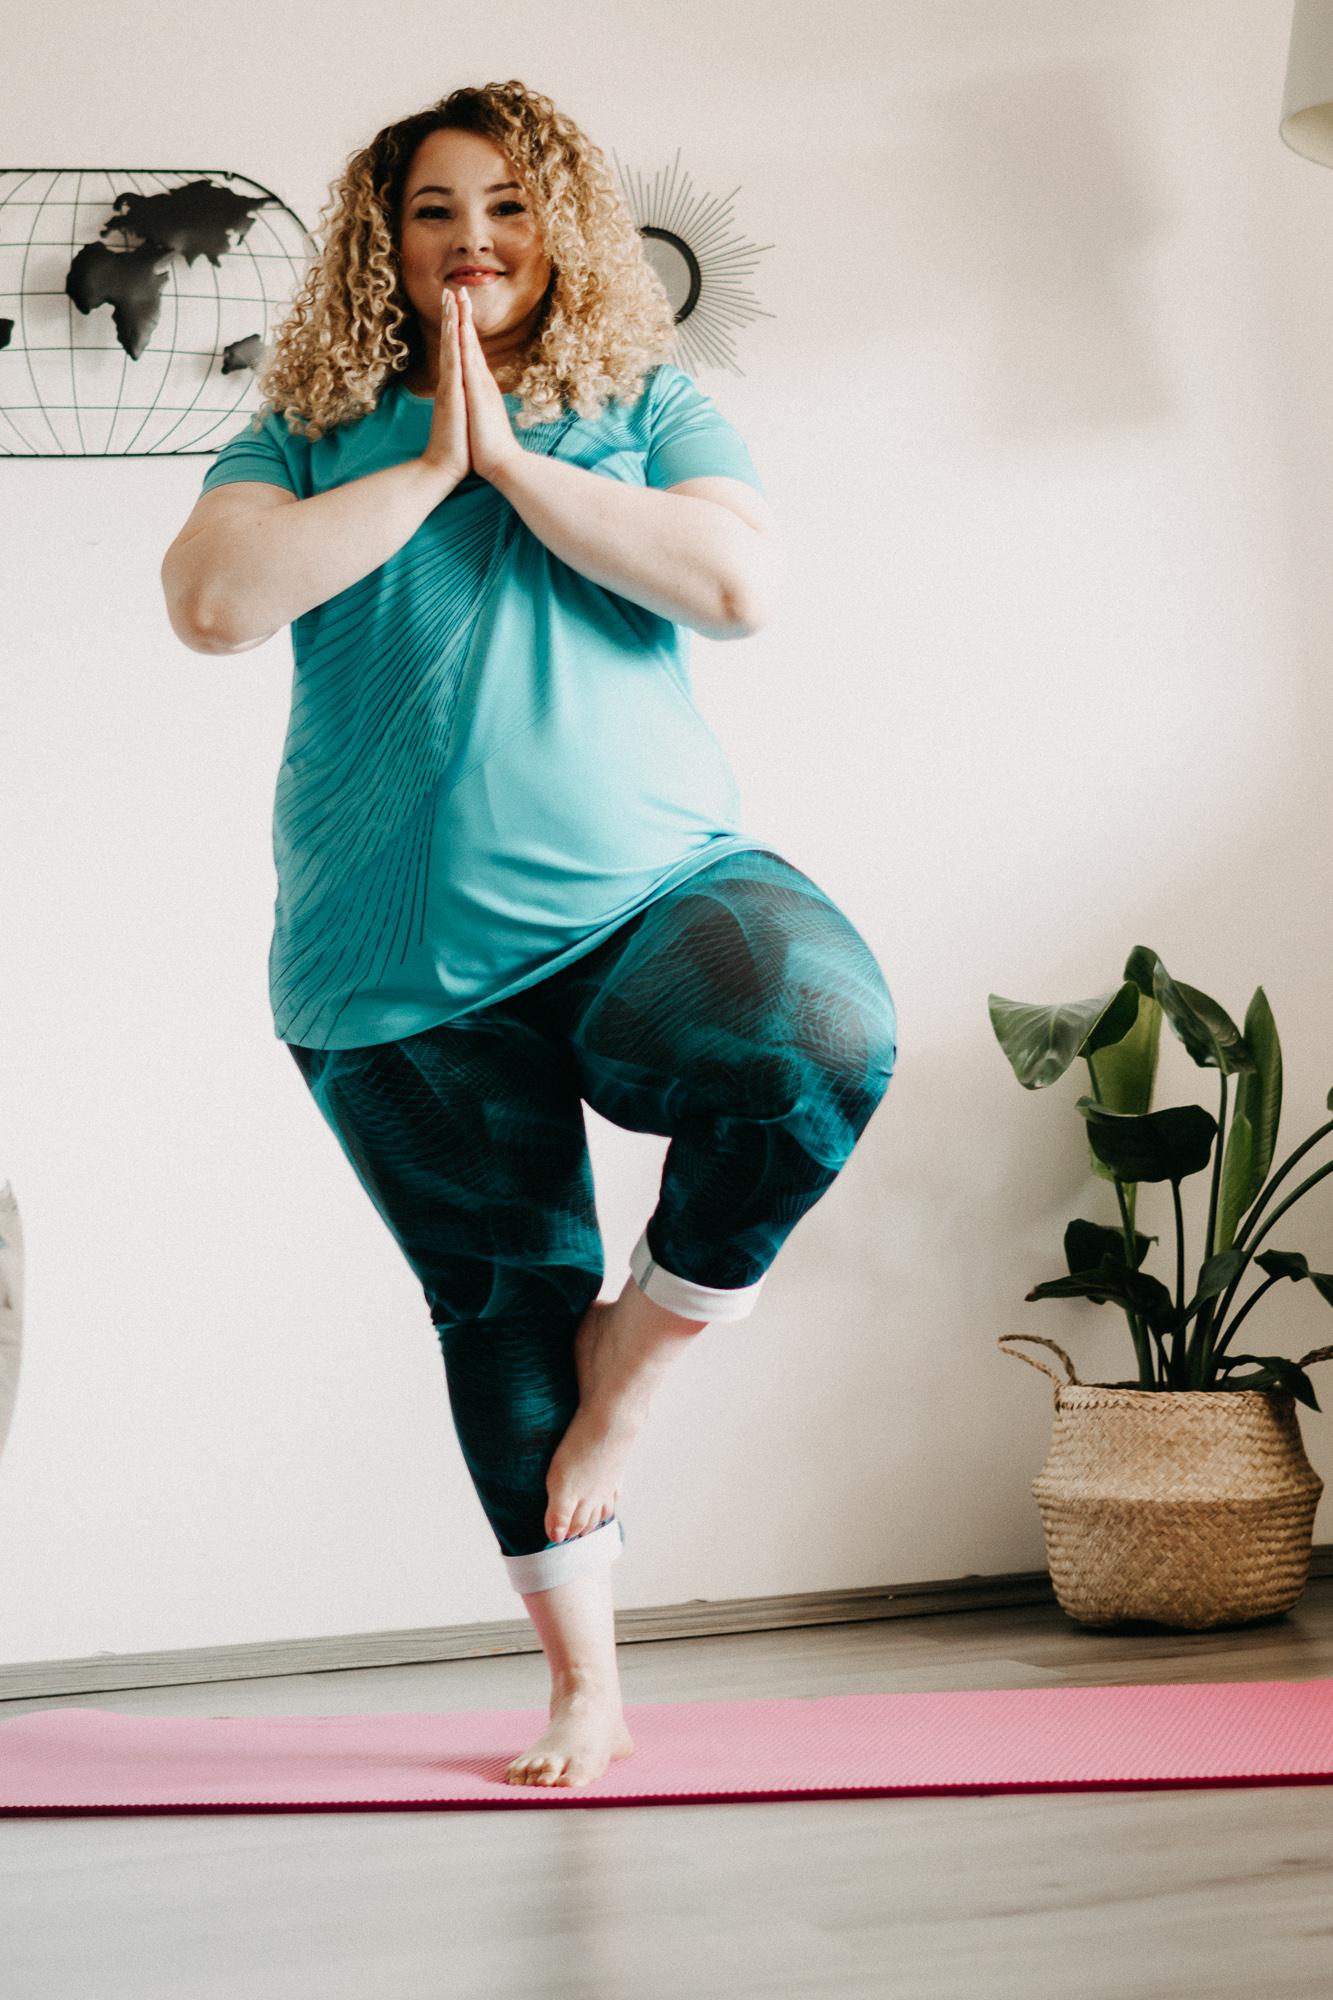 yoga_für_übergewichtige_sport_als_dicke_frau_mia_infatstyle